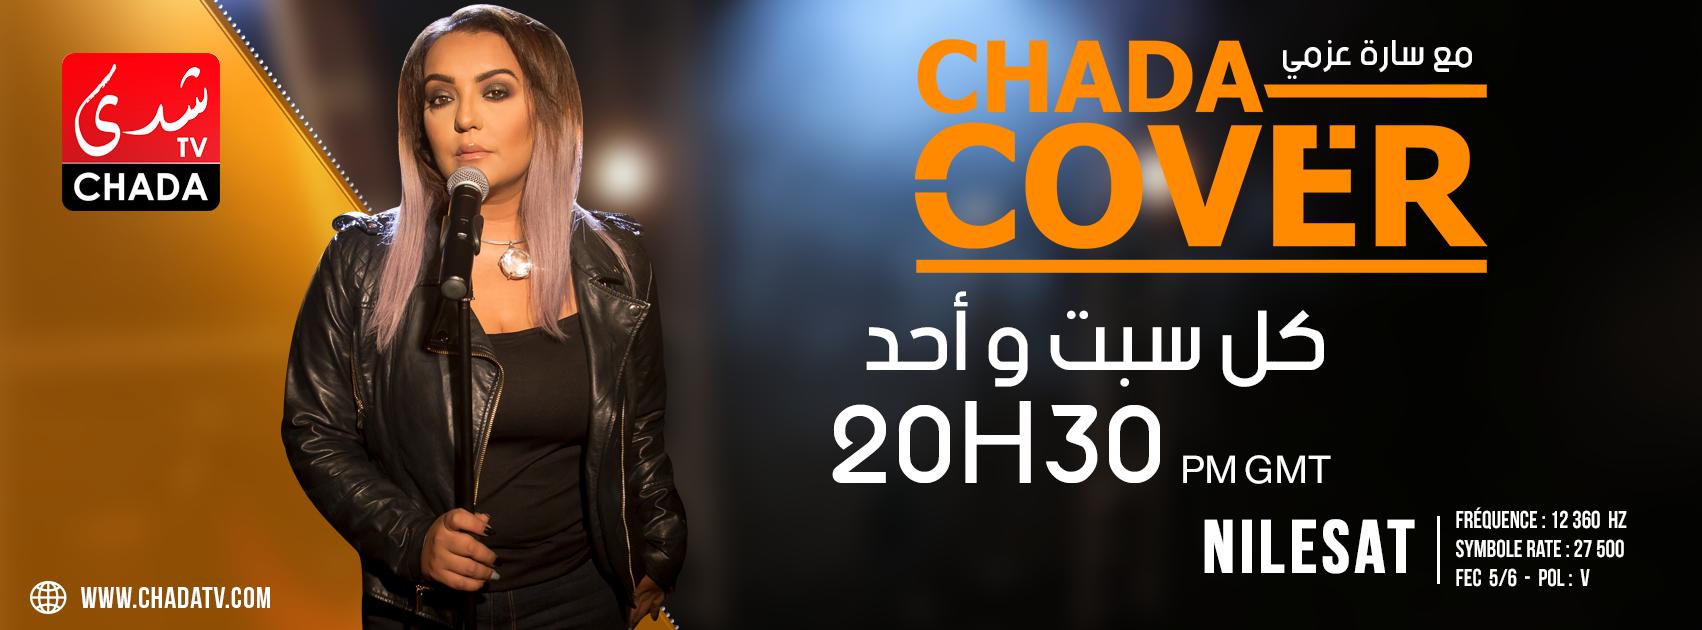 Chada cover